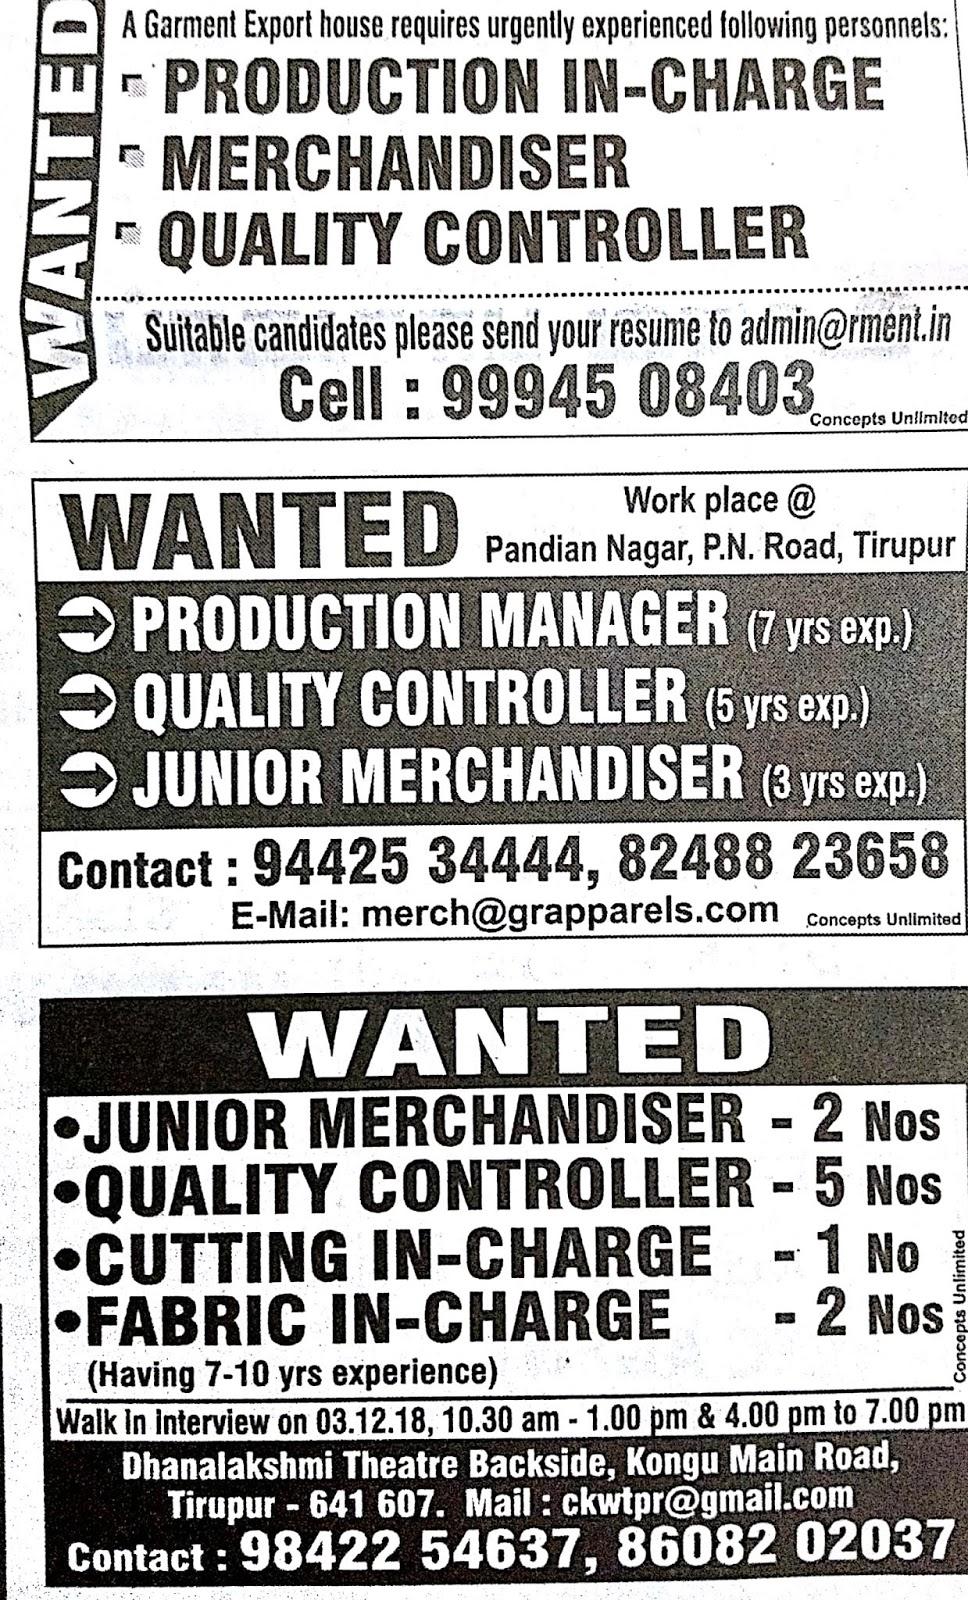 Wanted List Dinamalar Dt 02 12 2018 Part 3 - Jobs At Coimbatore